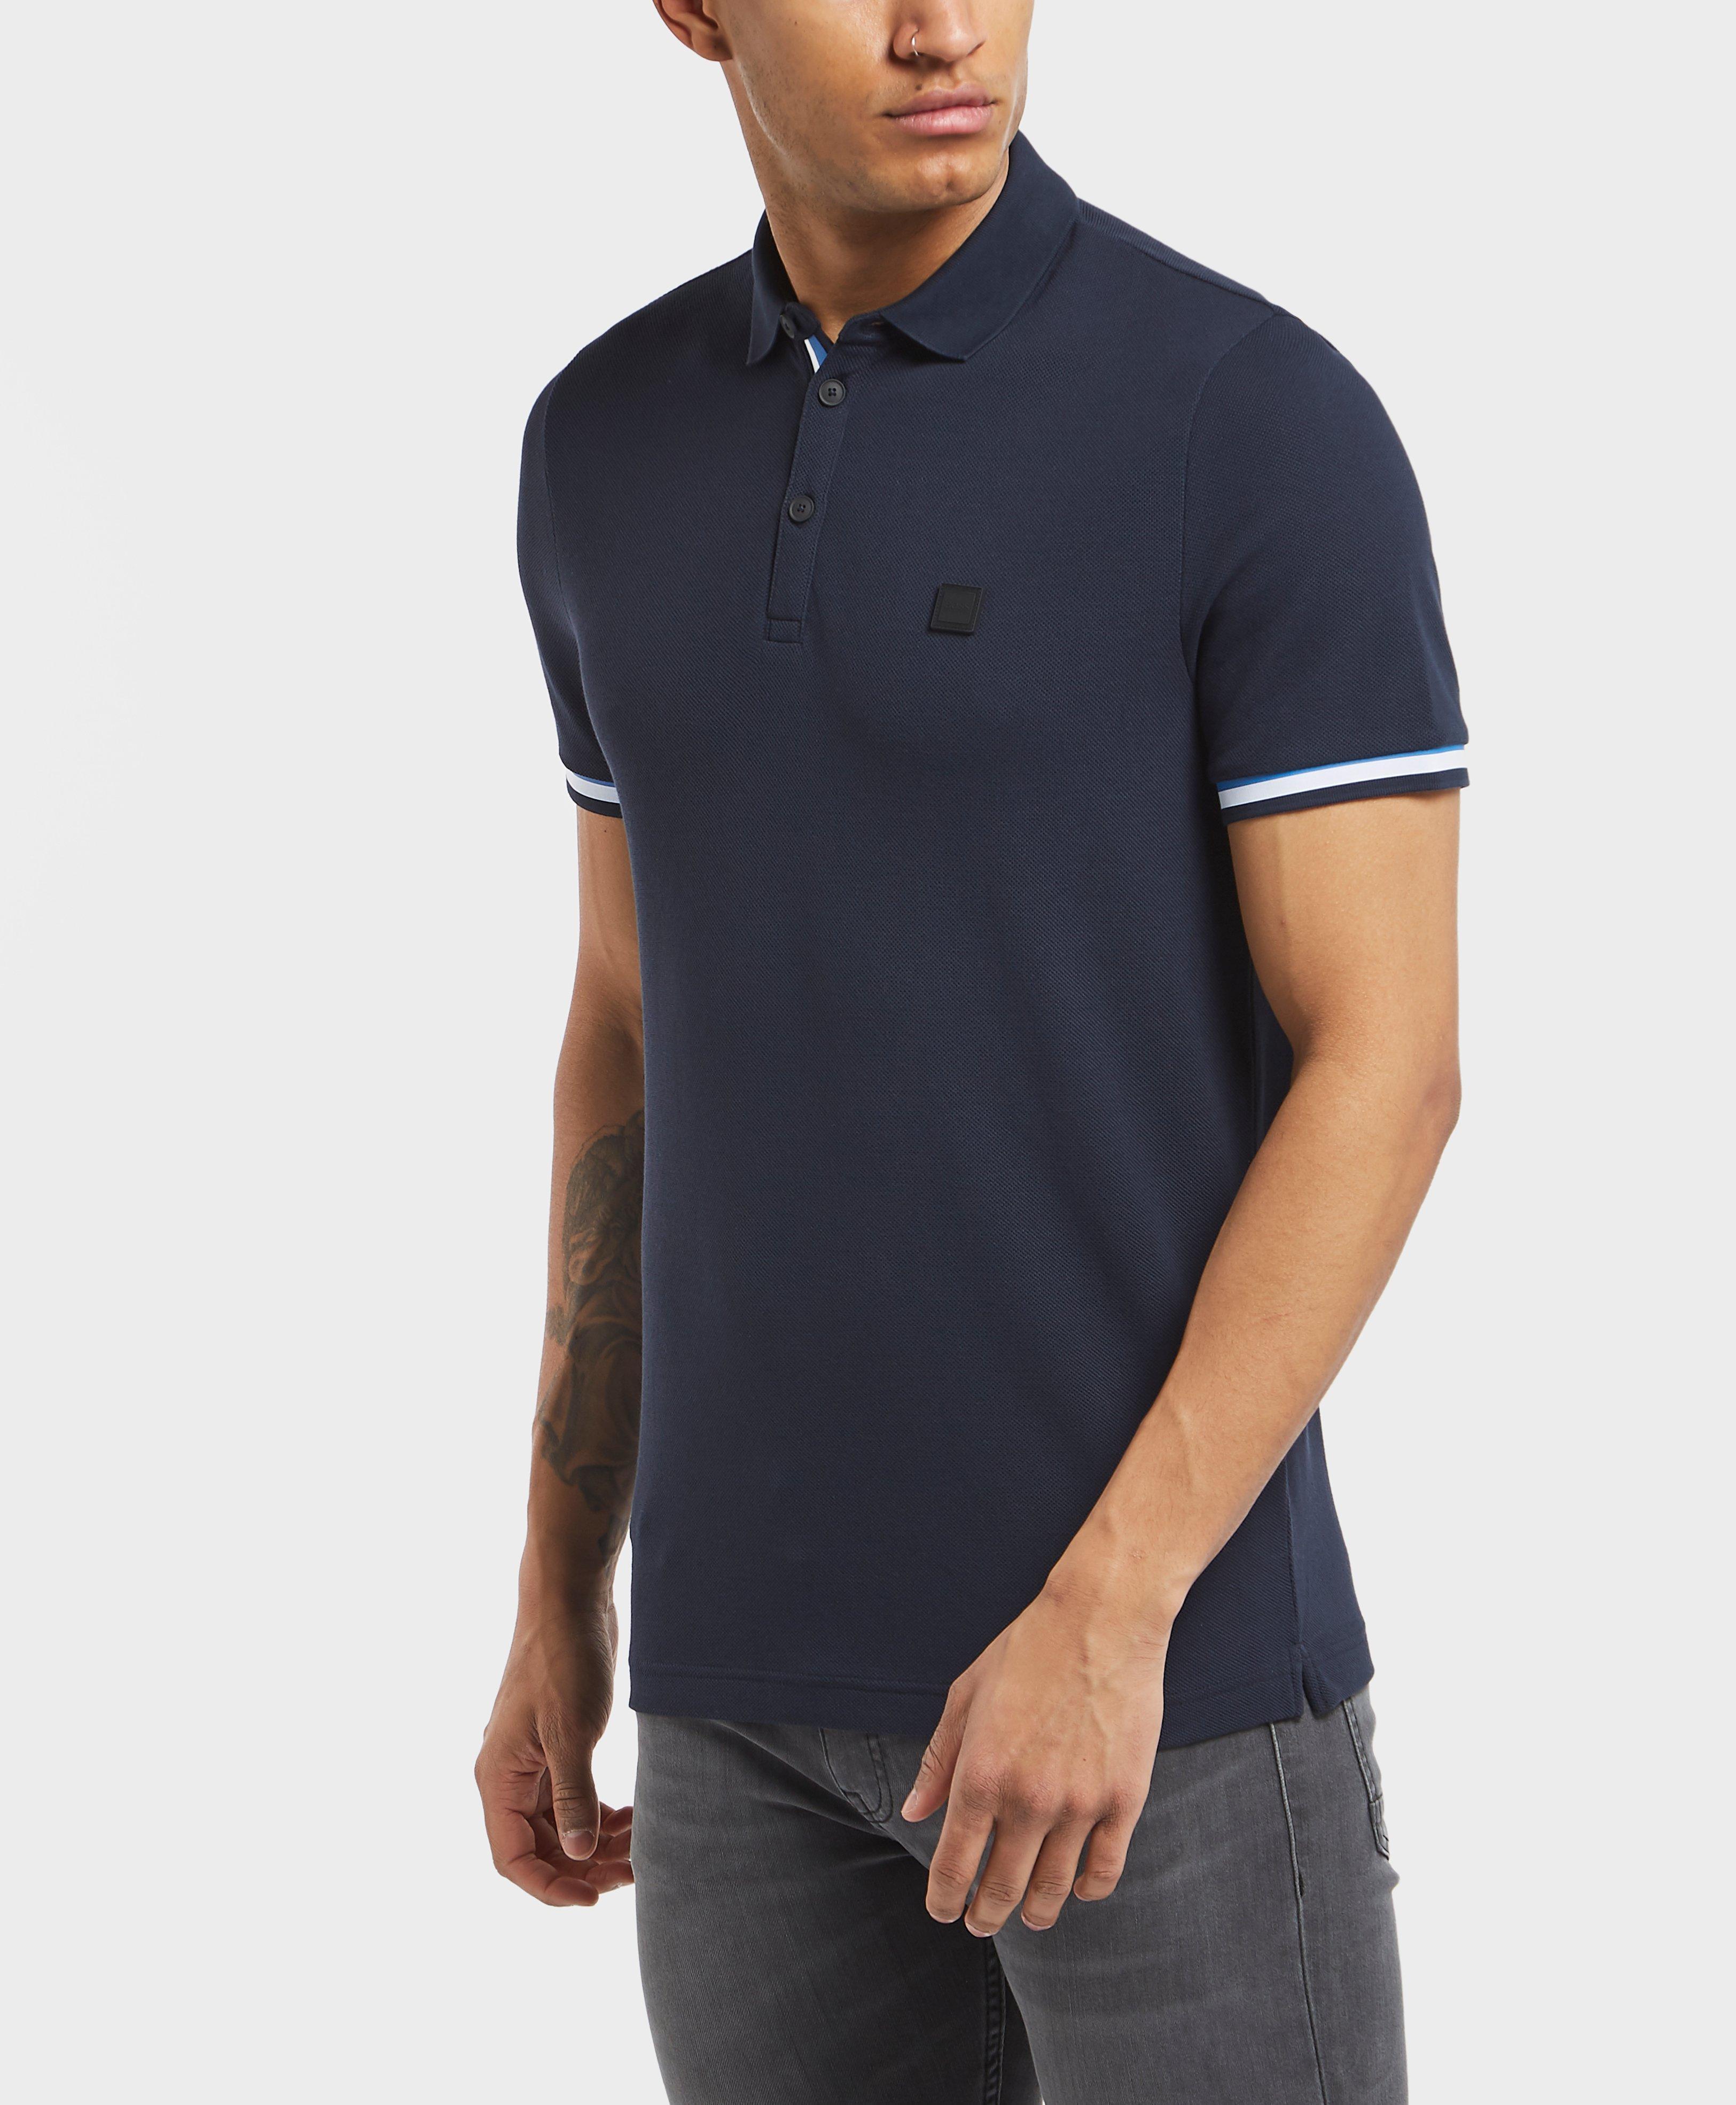 d8c3f5c55 Lyst - BOSS Print Pique Short Sleeve Polo Shirt in Blue for Men